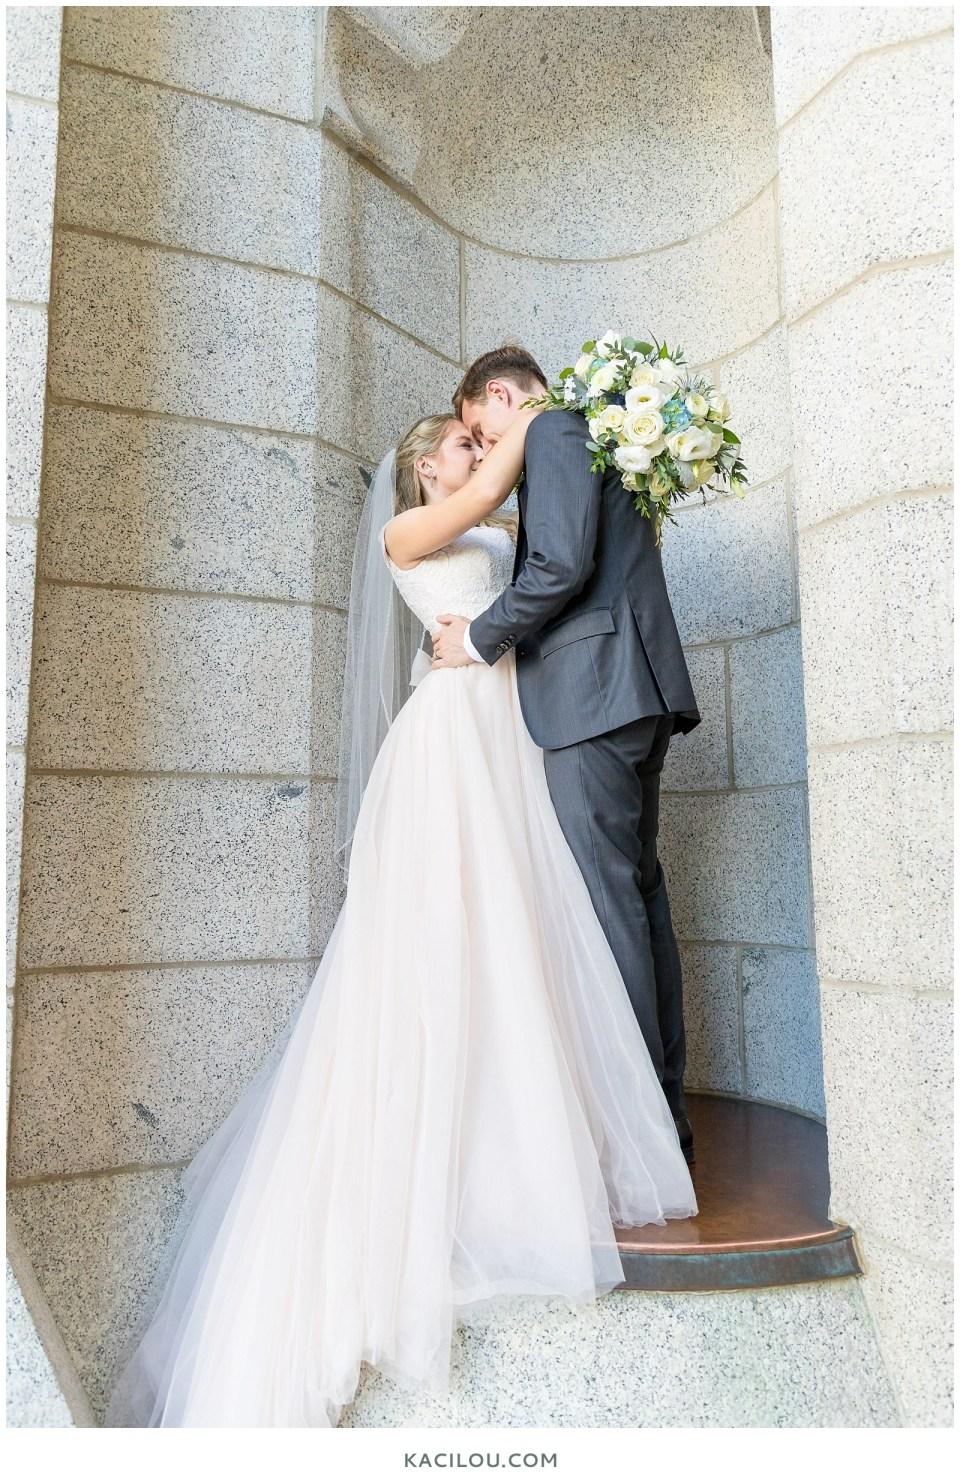 Salt Lake City Temple Wedding Photos by Kaci Lou Photography for Sam and Kennedy-7035.jpg